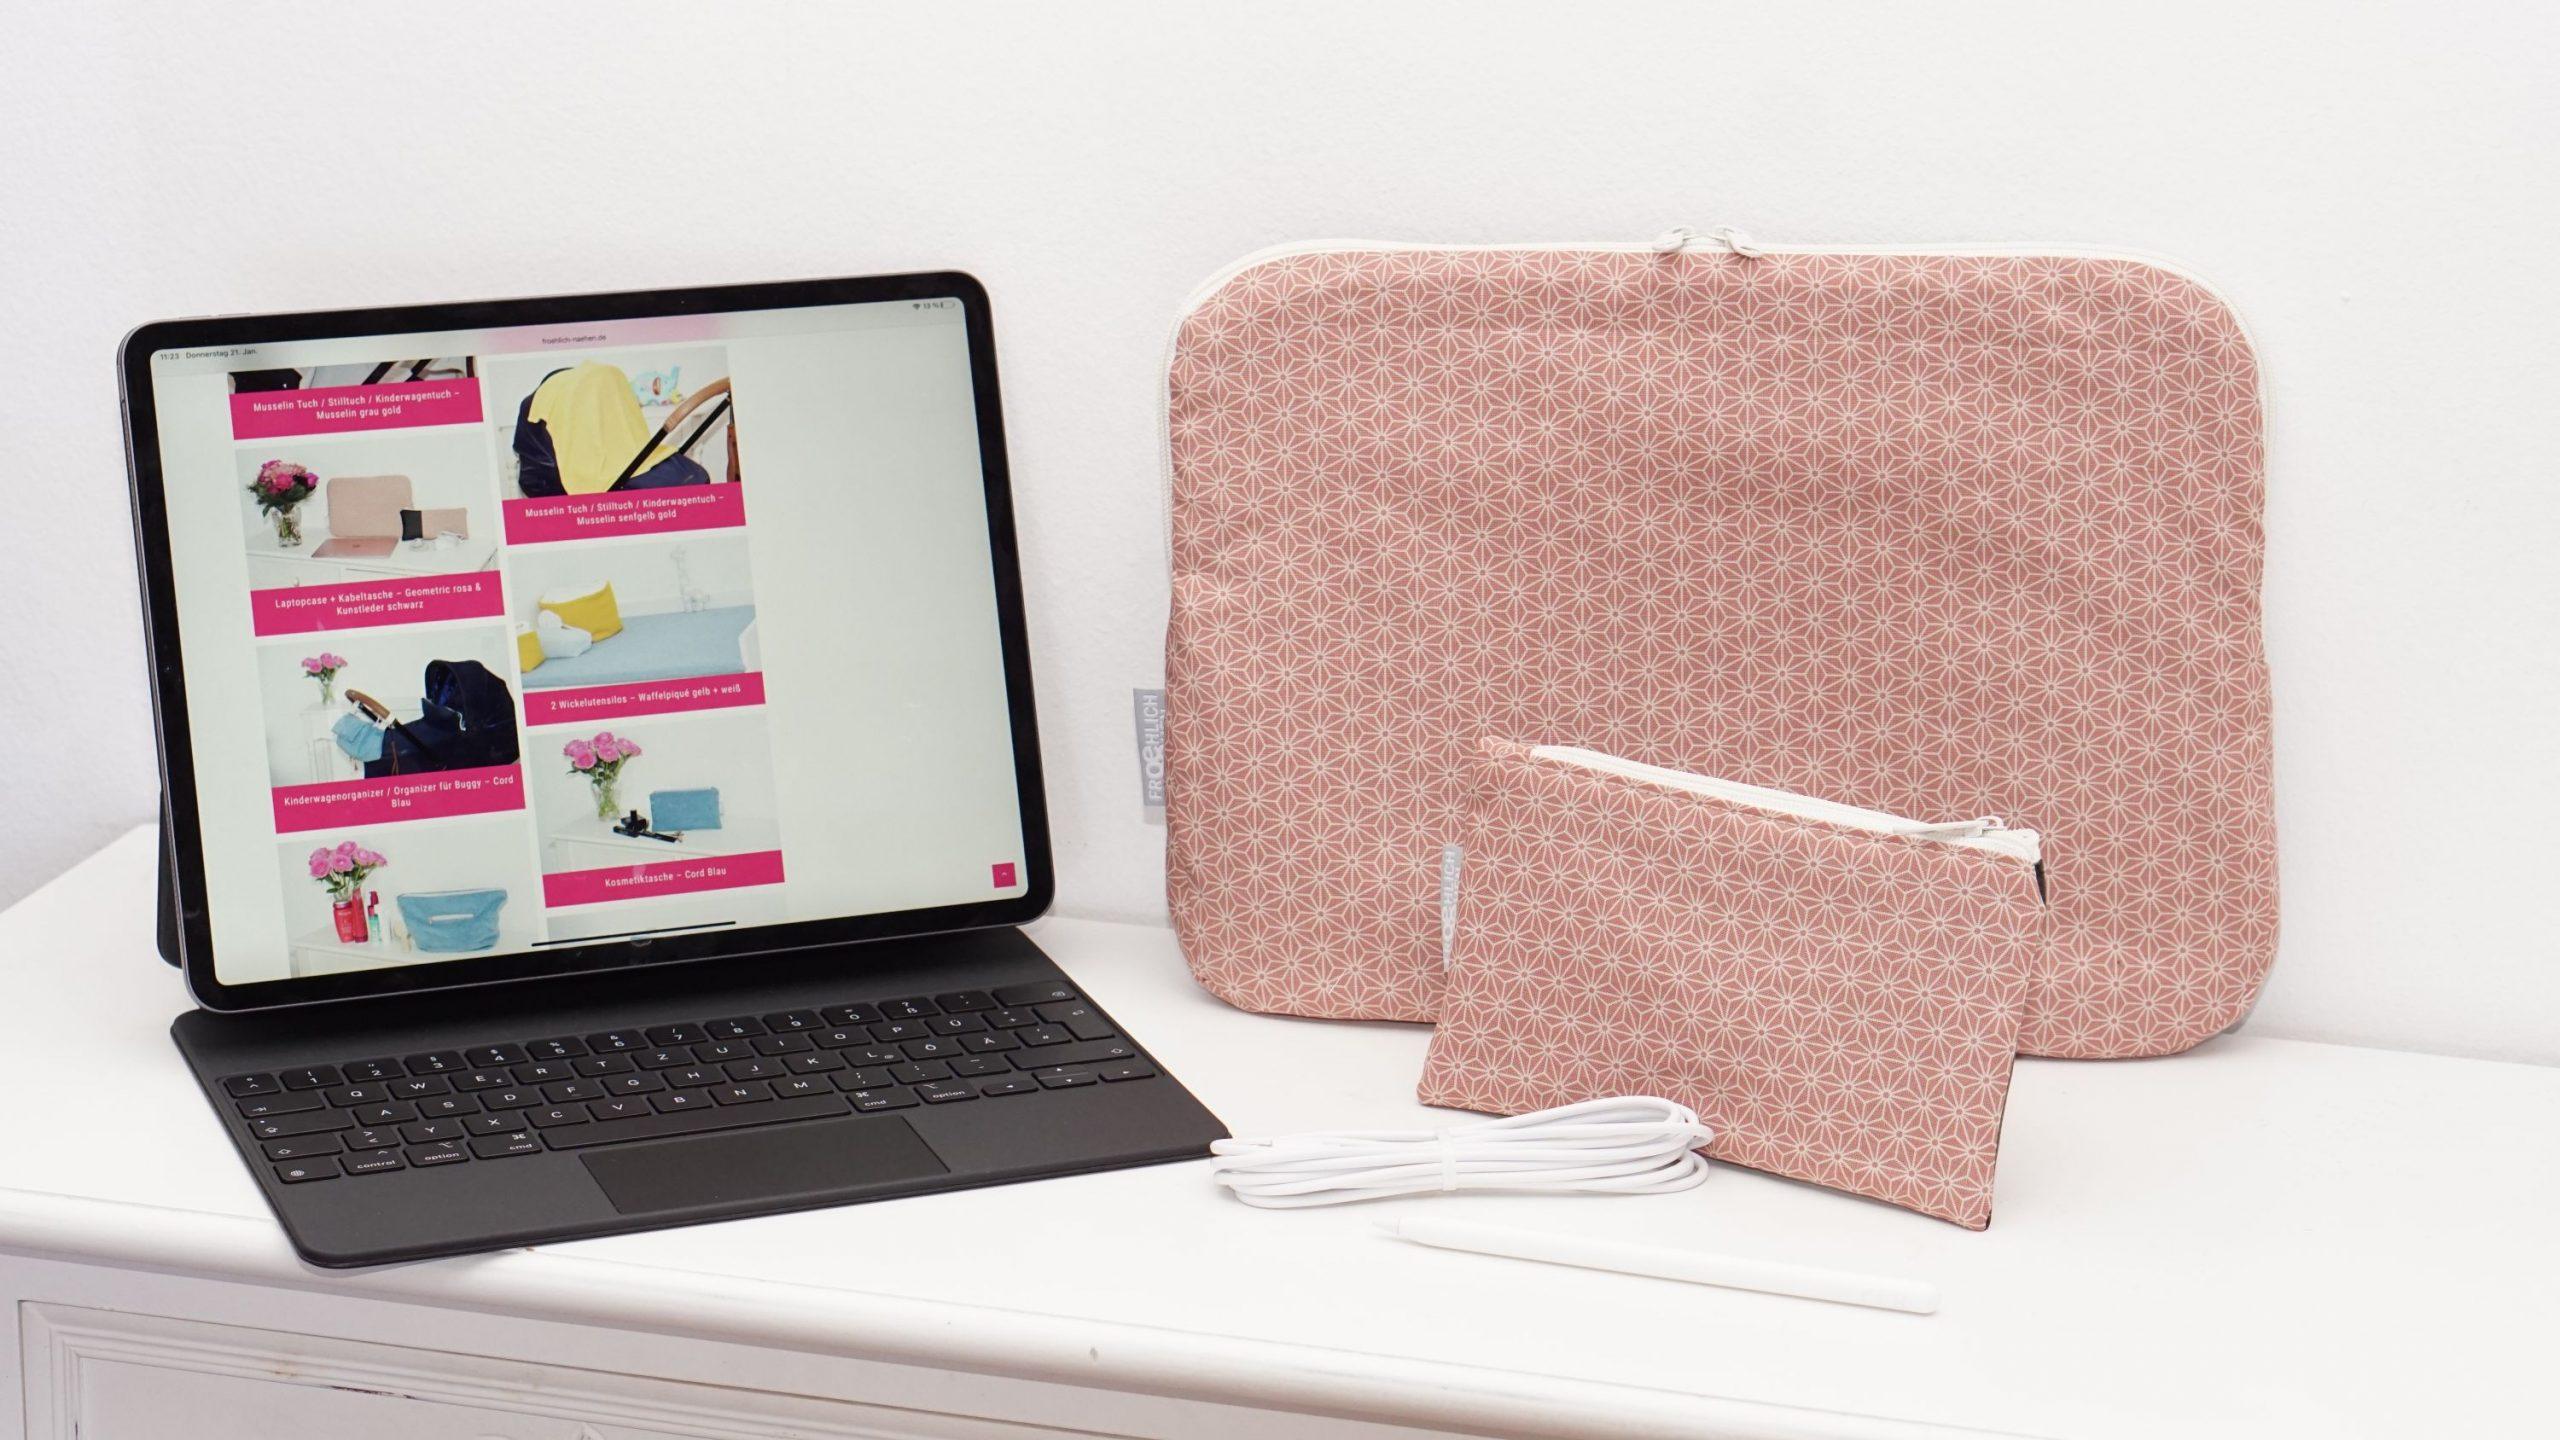 Laptophülle MacBook Case Hülle Notbookhülle Geometric Miki japanisch Altrosa rosa grau Kunstleder schwarz